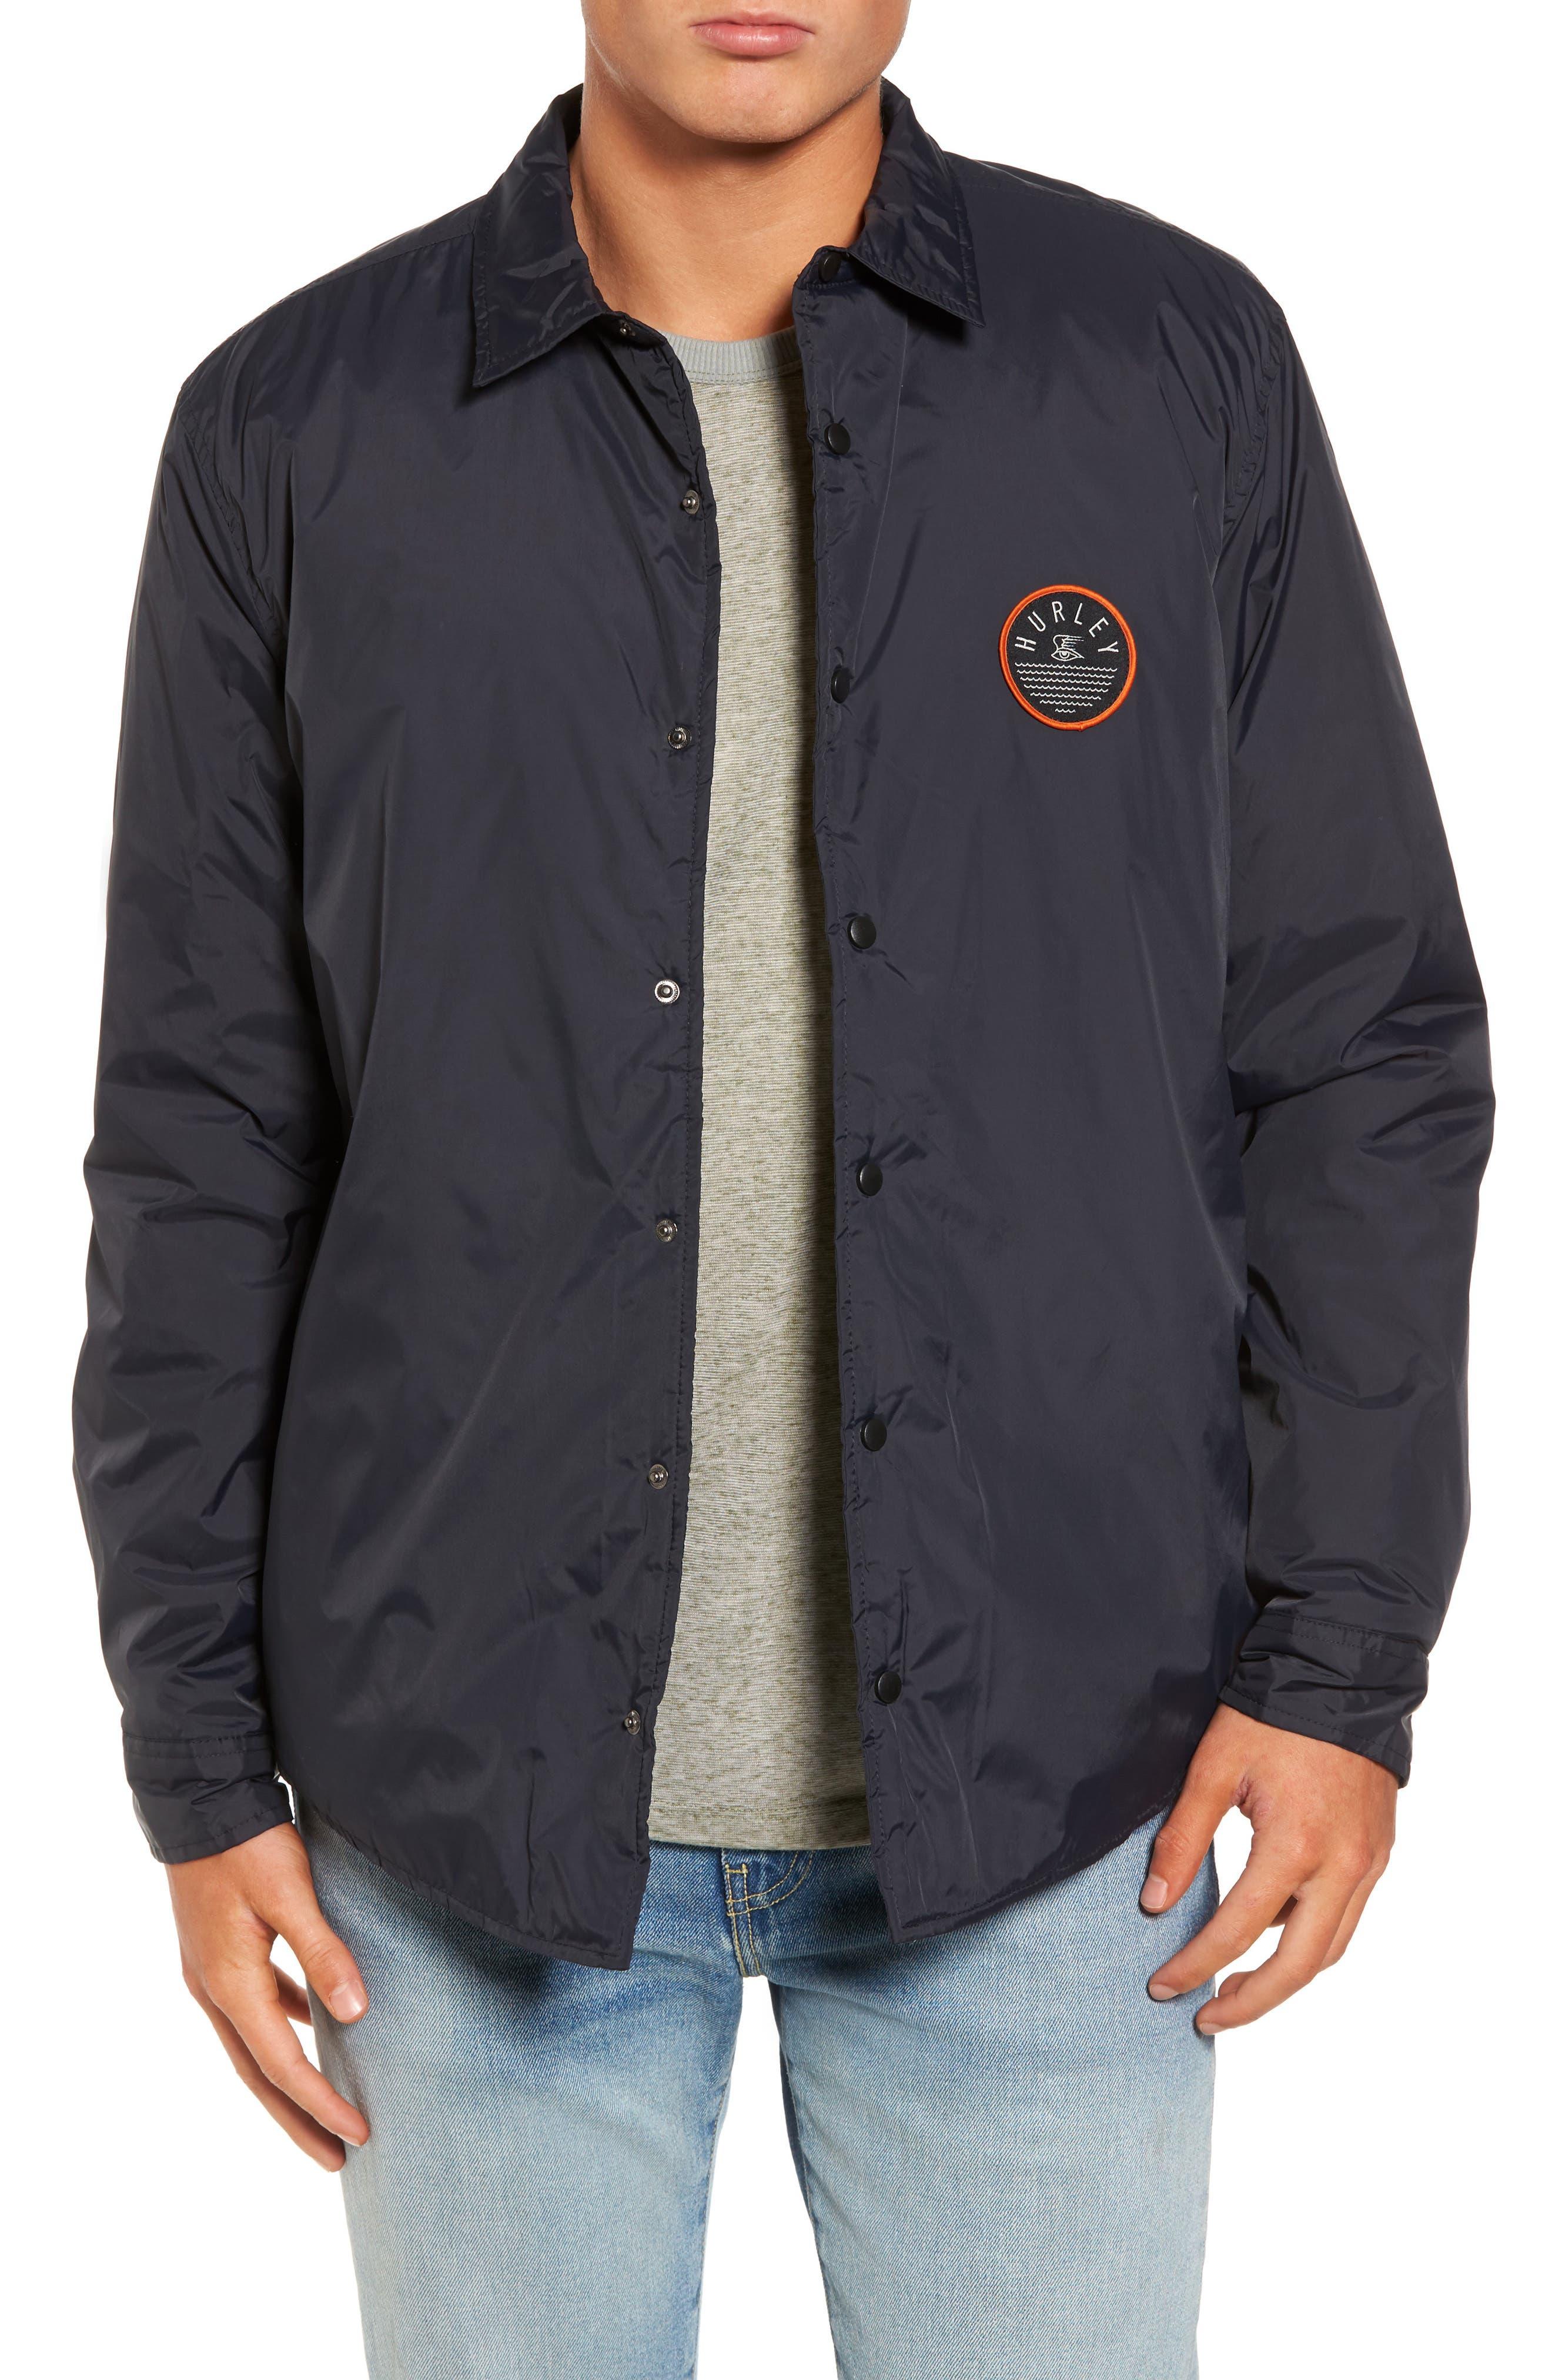 Main Image - Hurley Portland Jacket